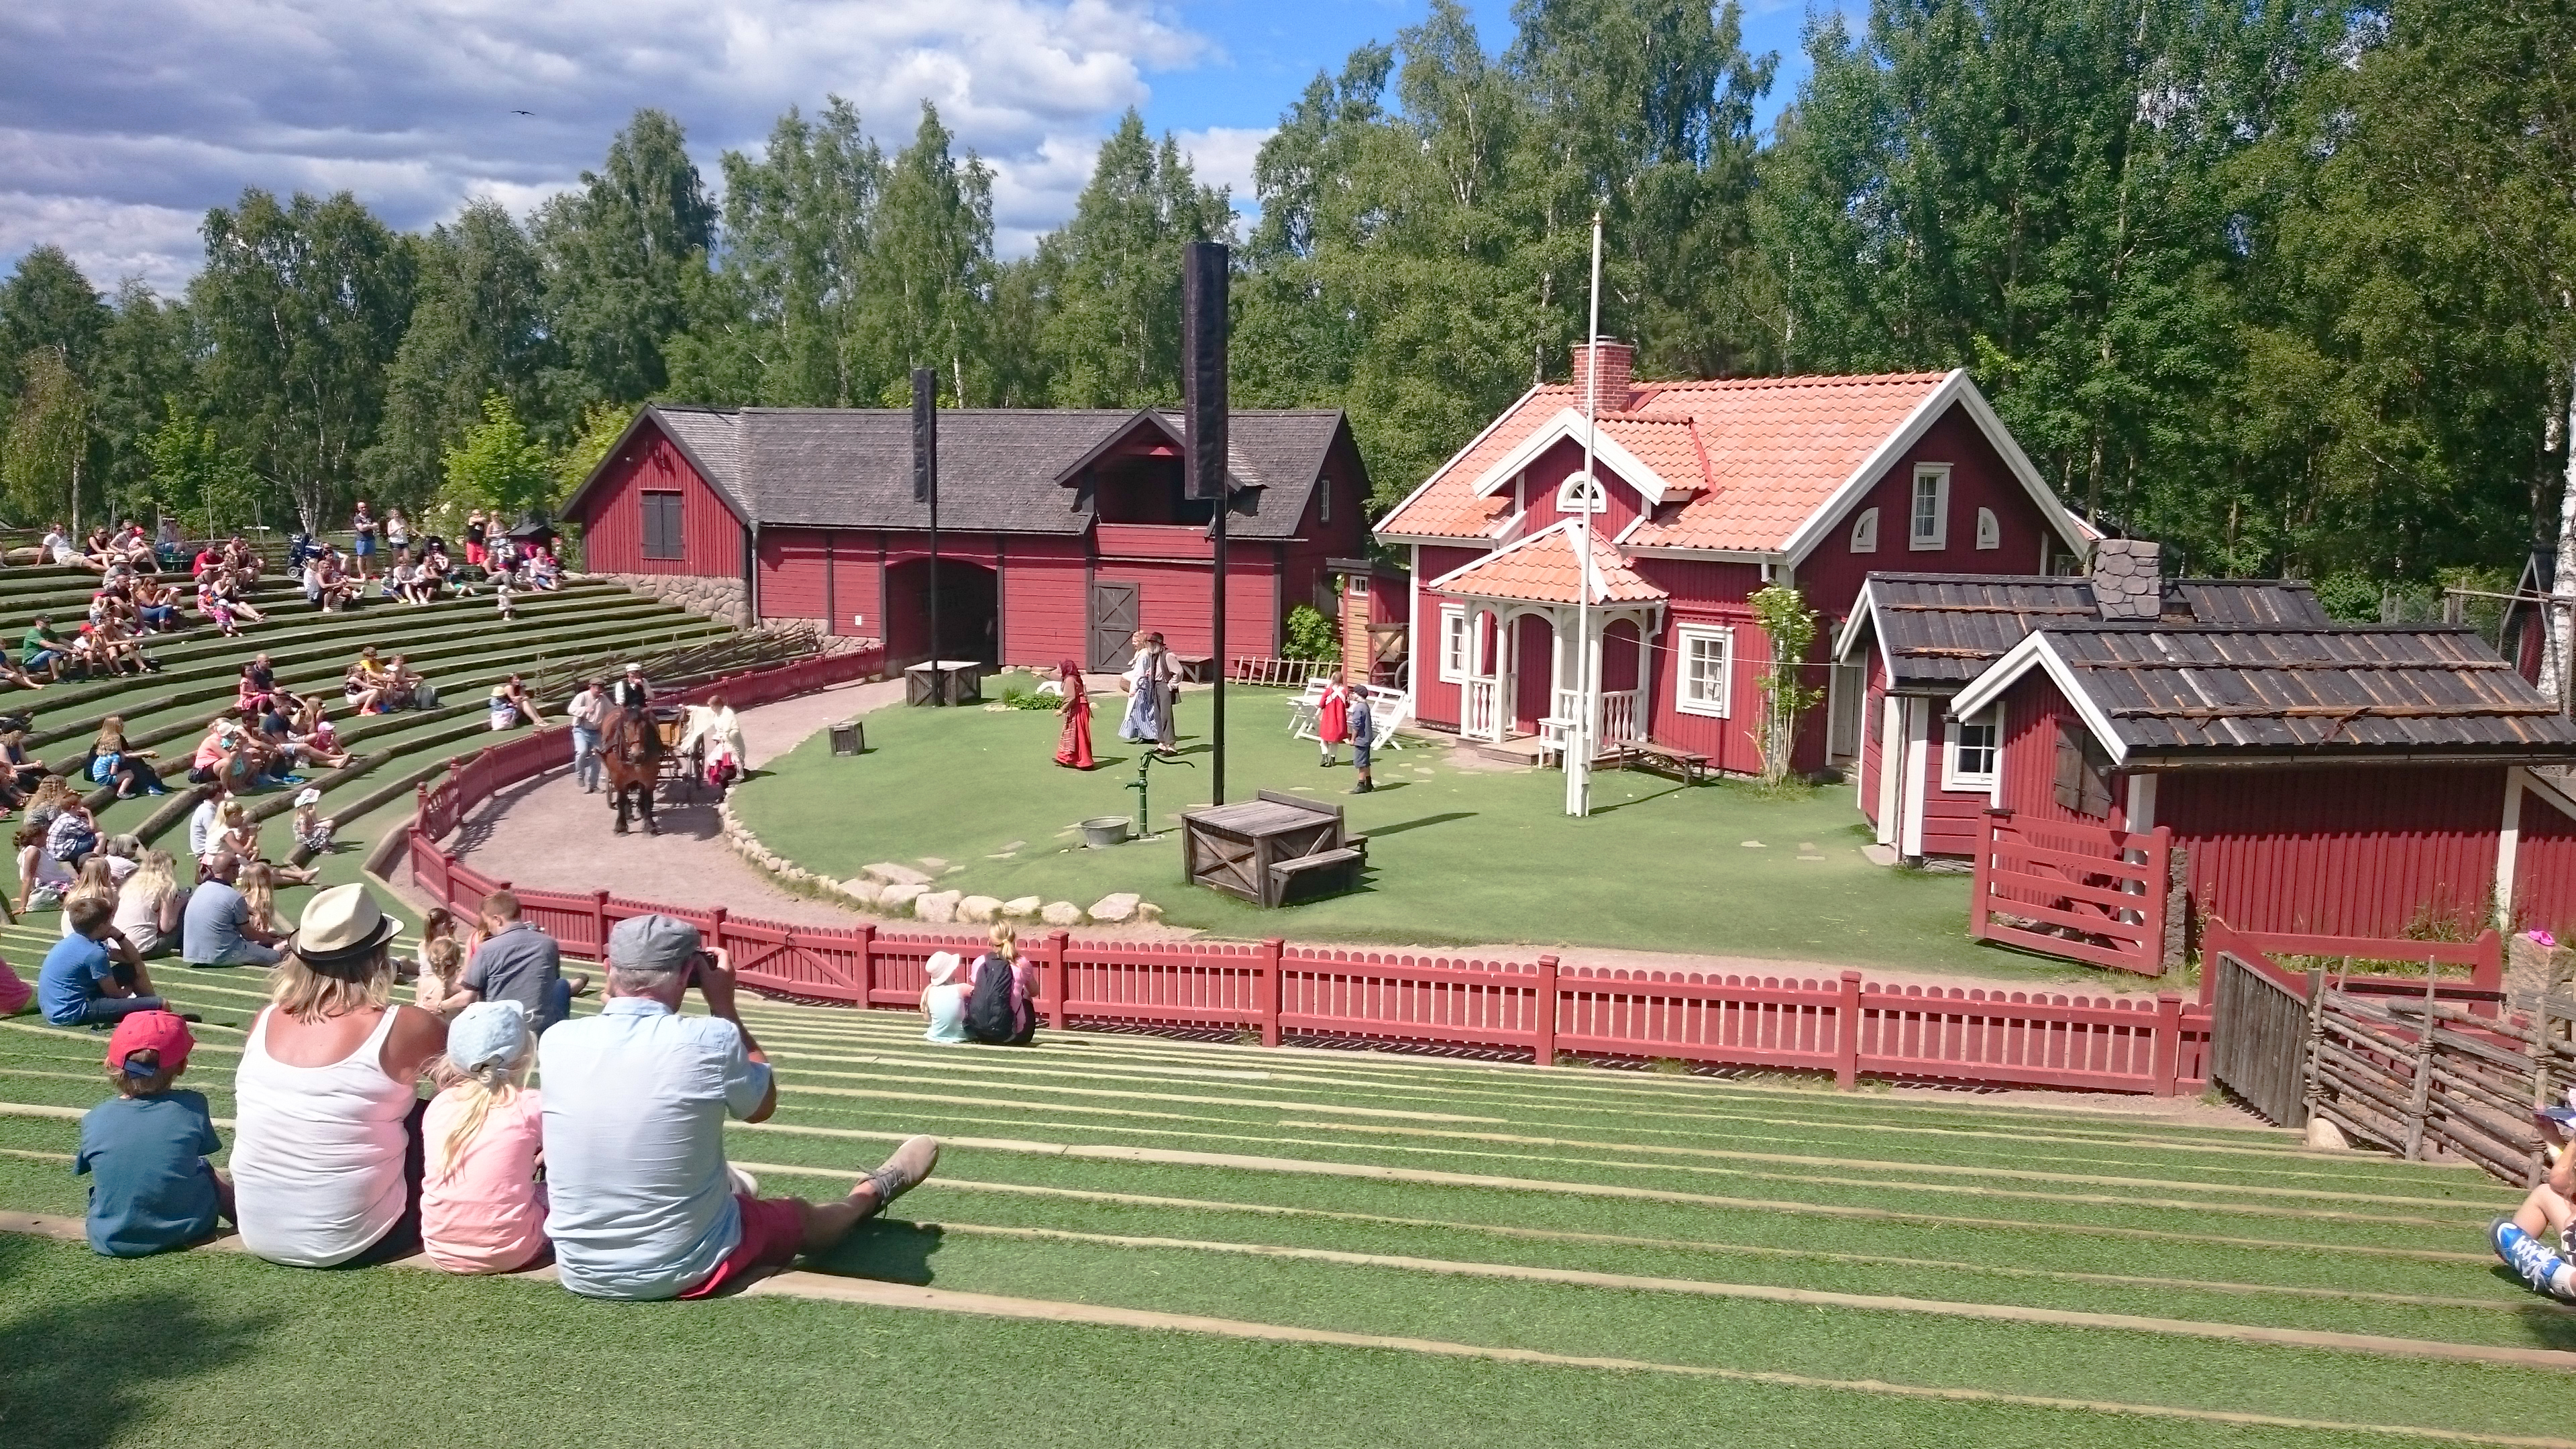 Le Monde d'Astrid Lindgren, Vimmerby